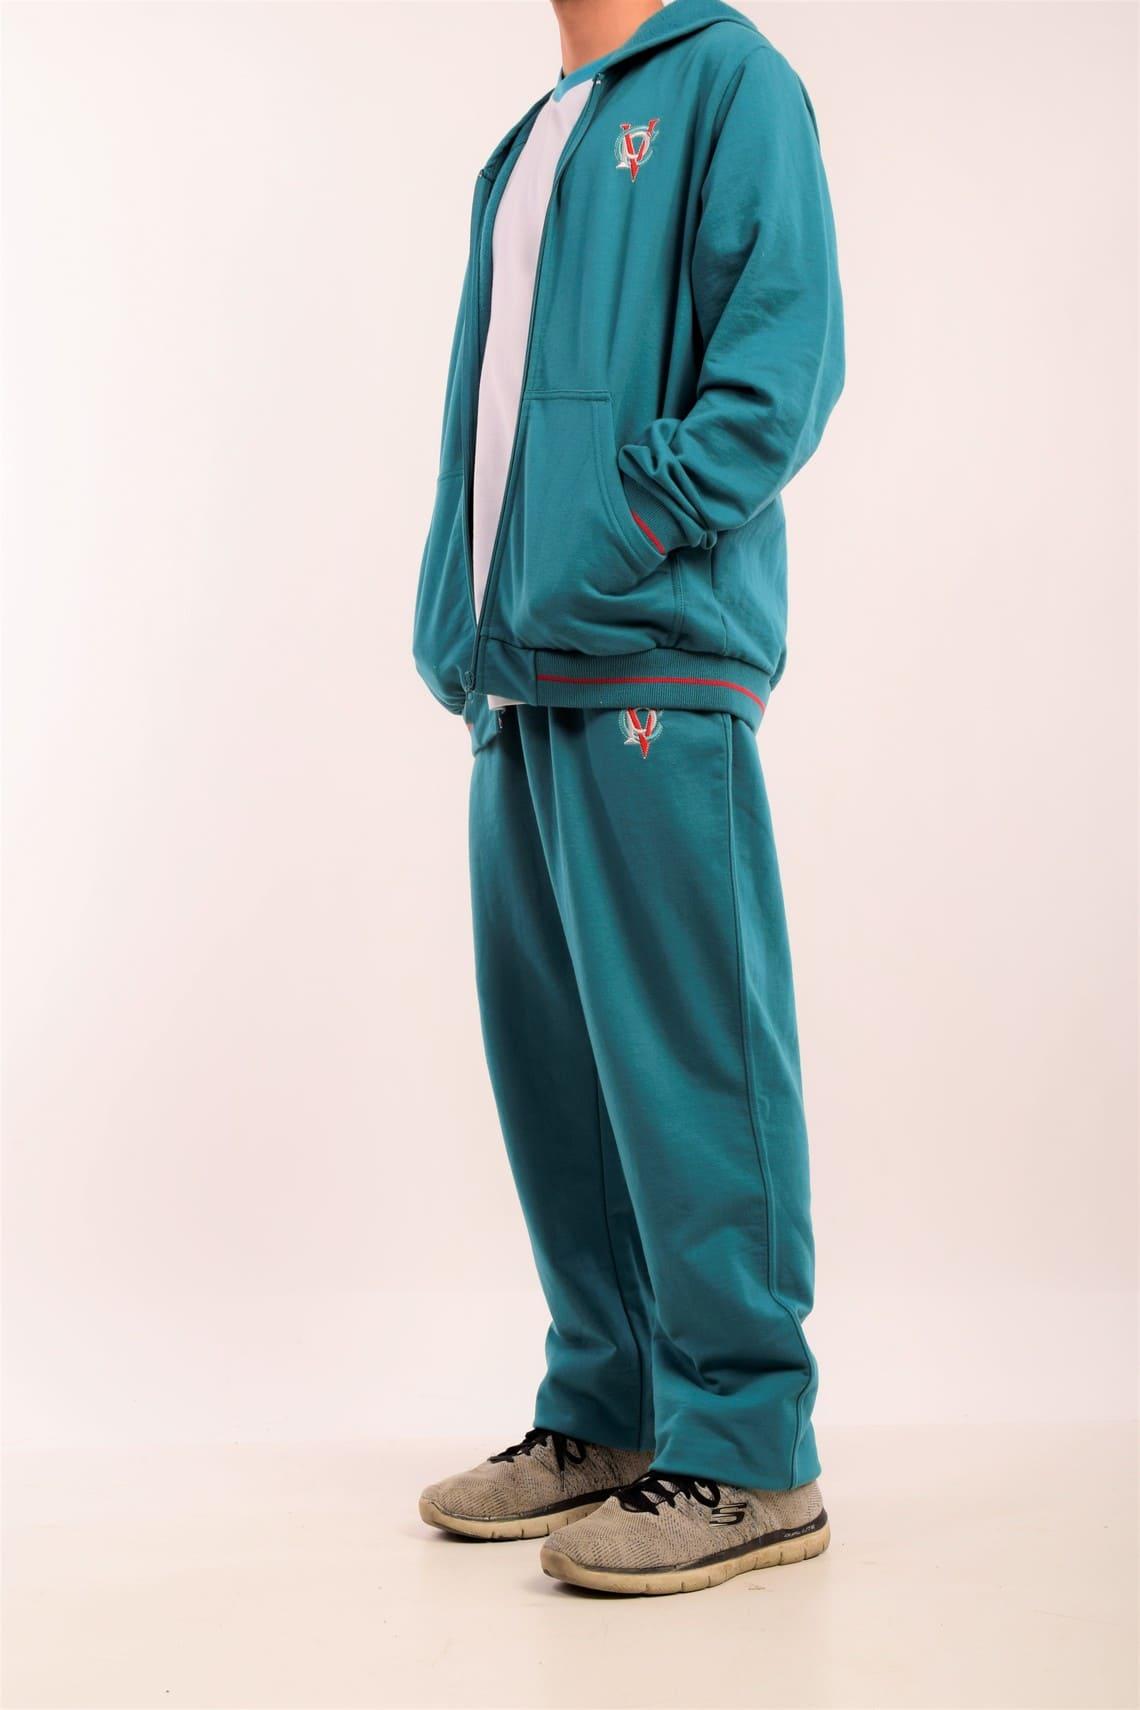 Pantalon Buzo Hombre (S - XL)